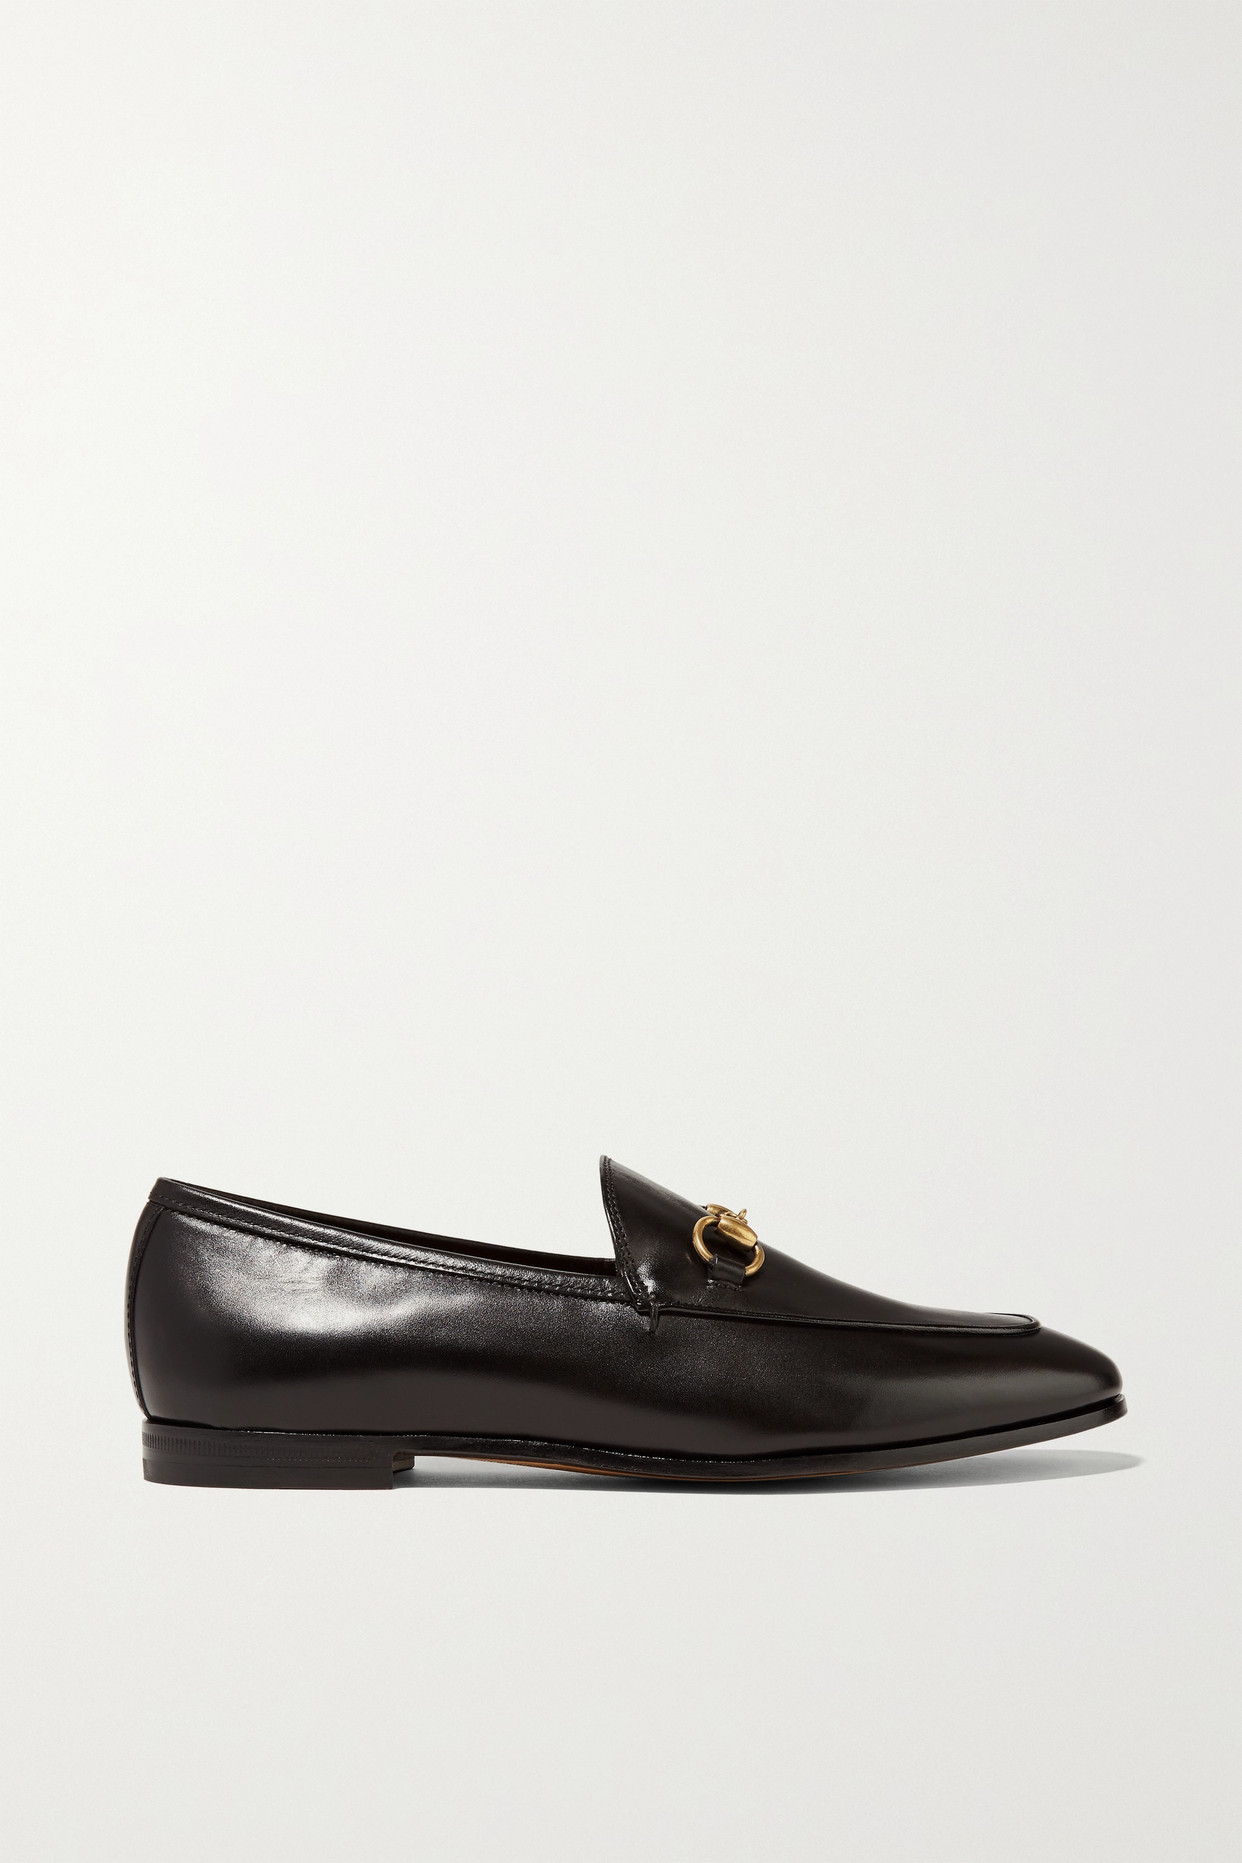 GUCCI - Jordaan Horsebit-detailed Leather Loafers - Black - IT42